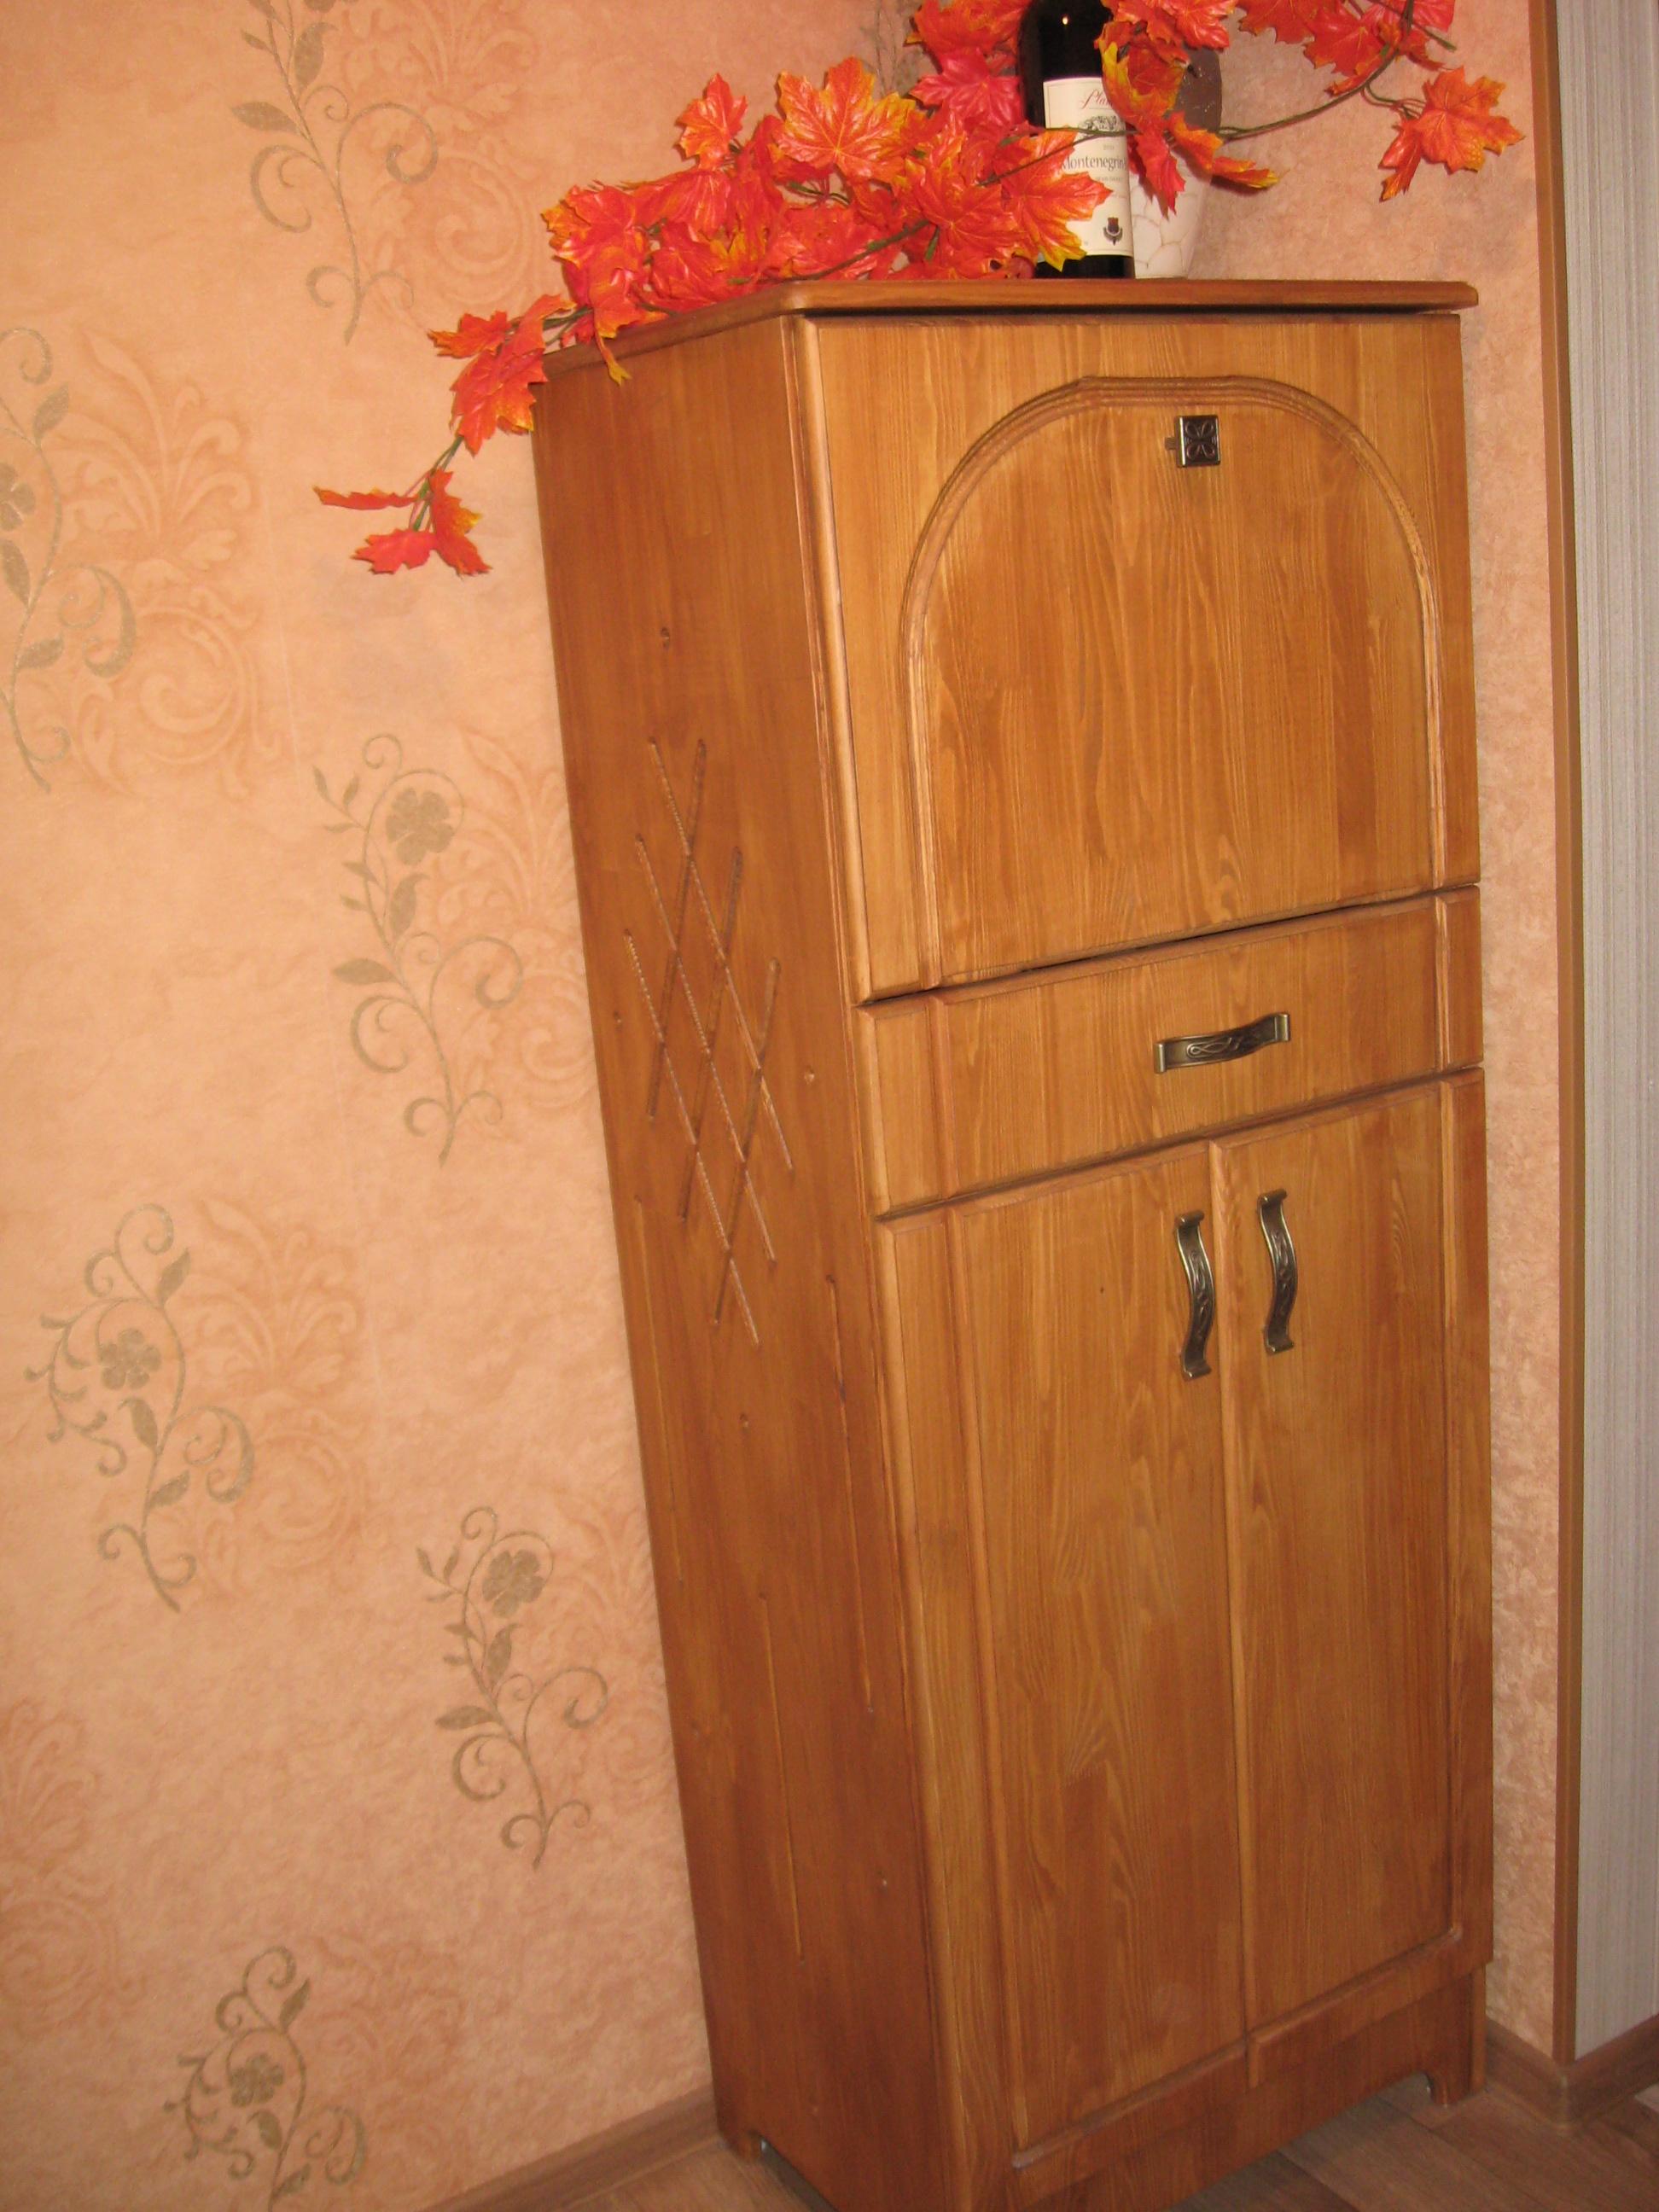 винный шкаф